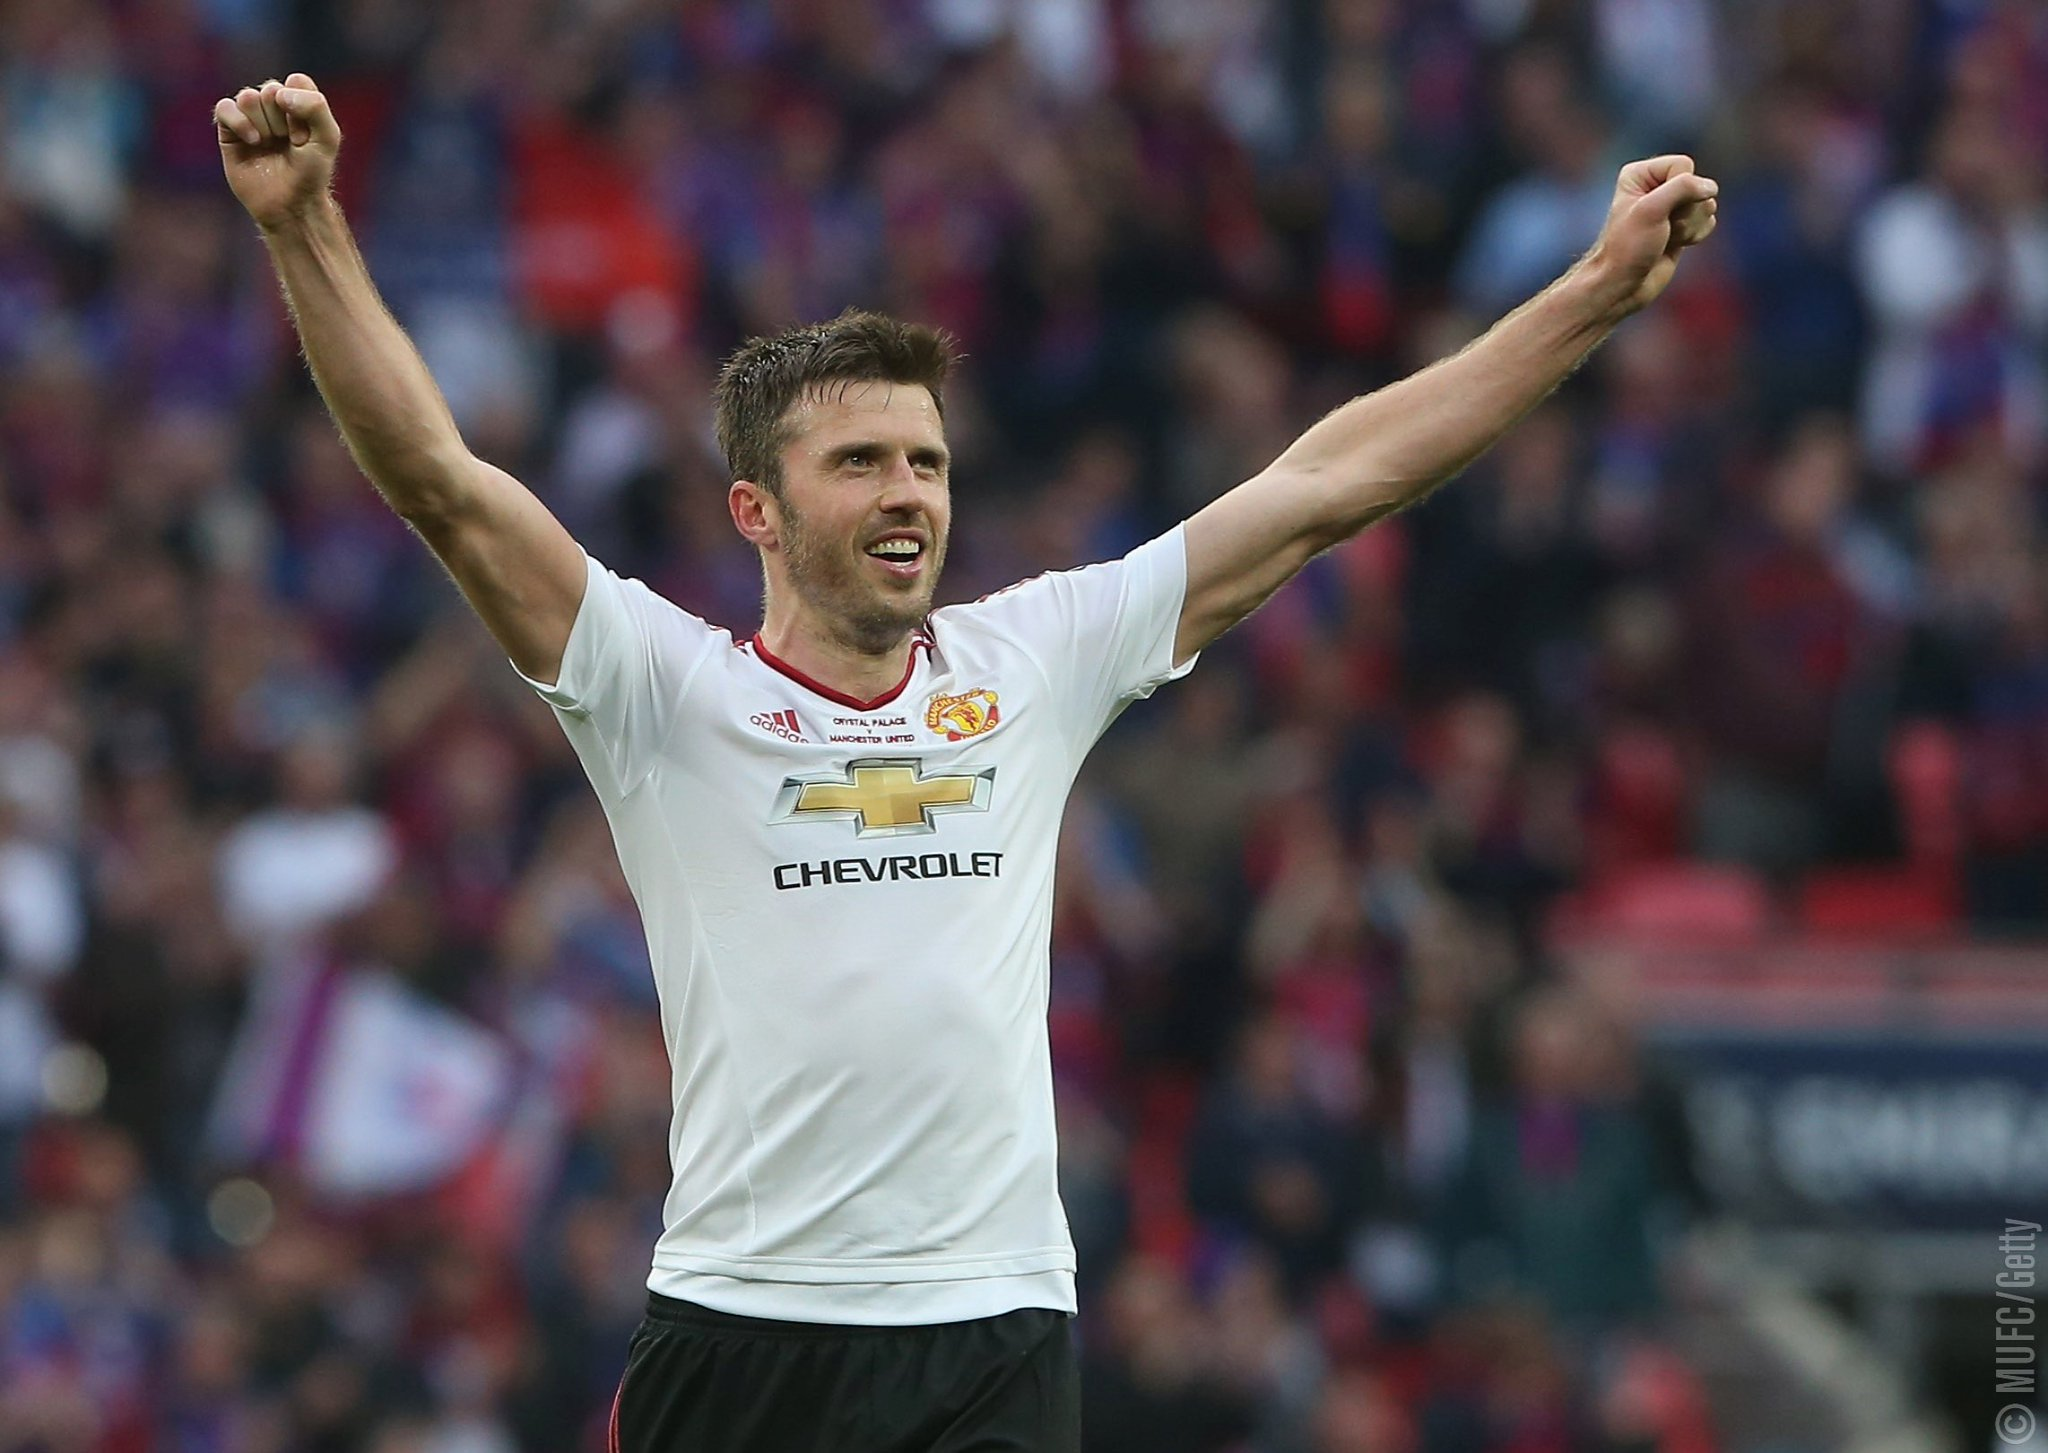 Daftar Pemain Manchester United 2016 2017